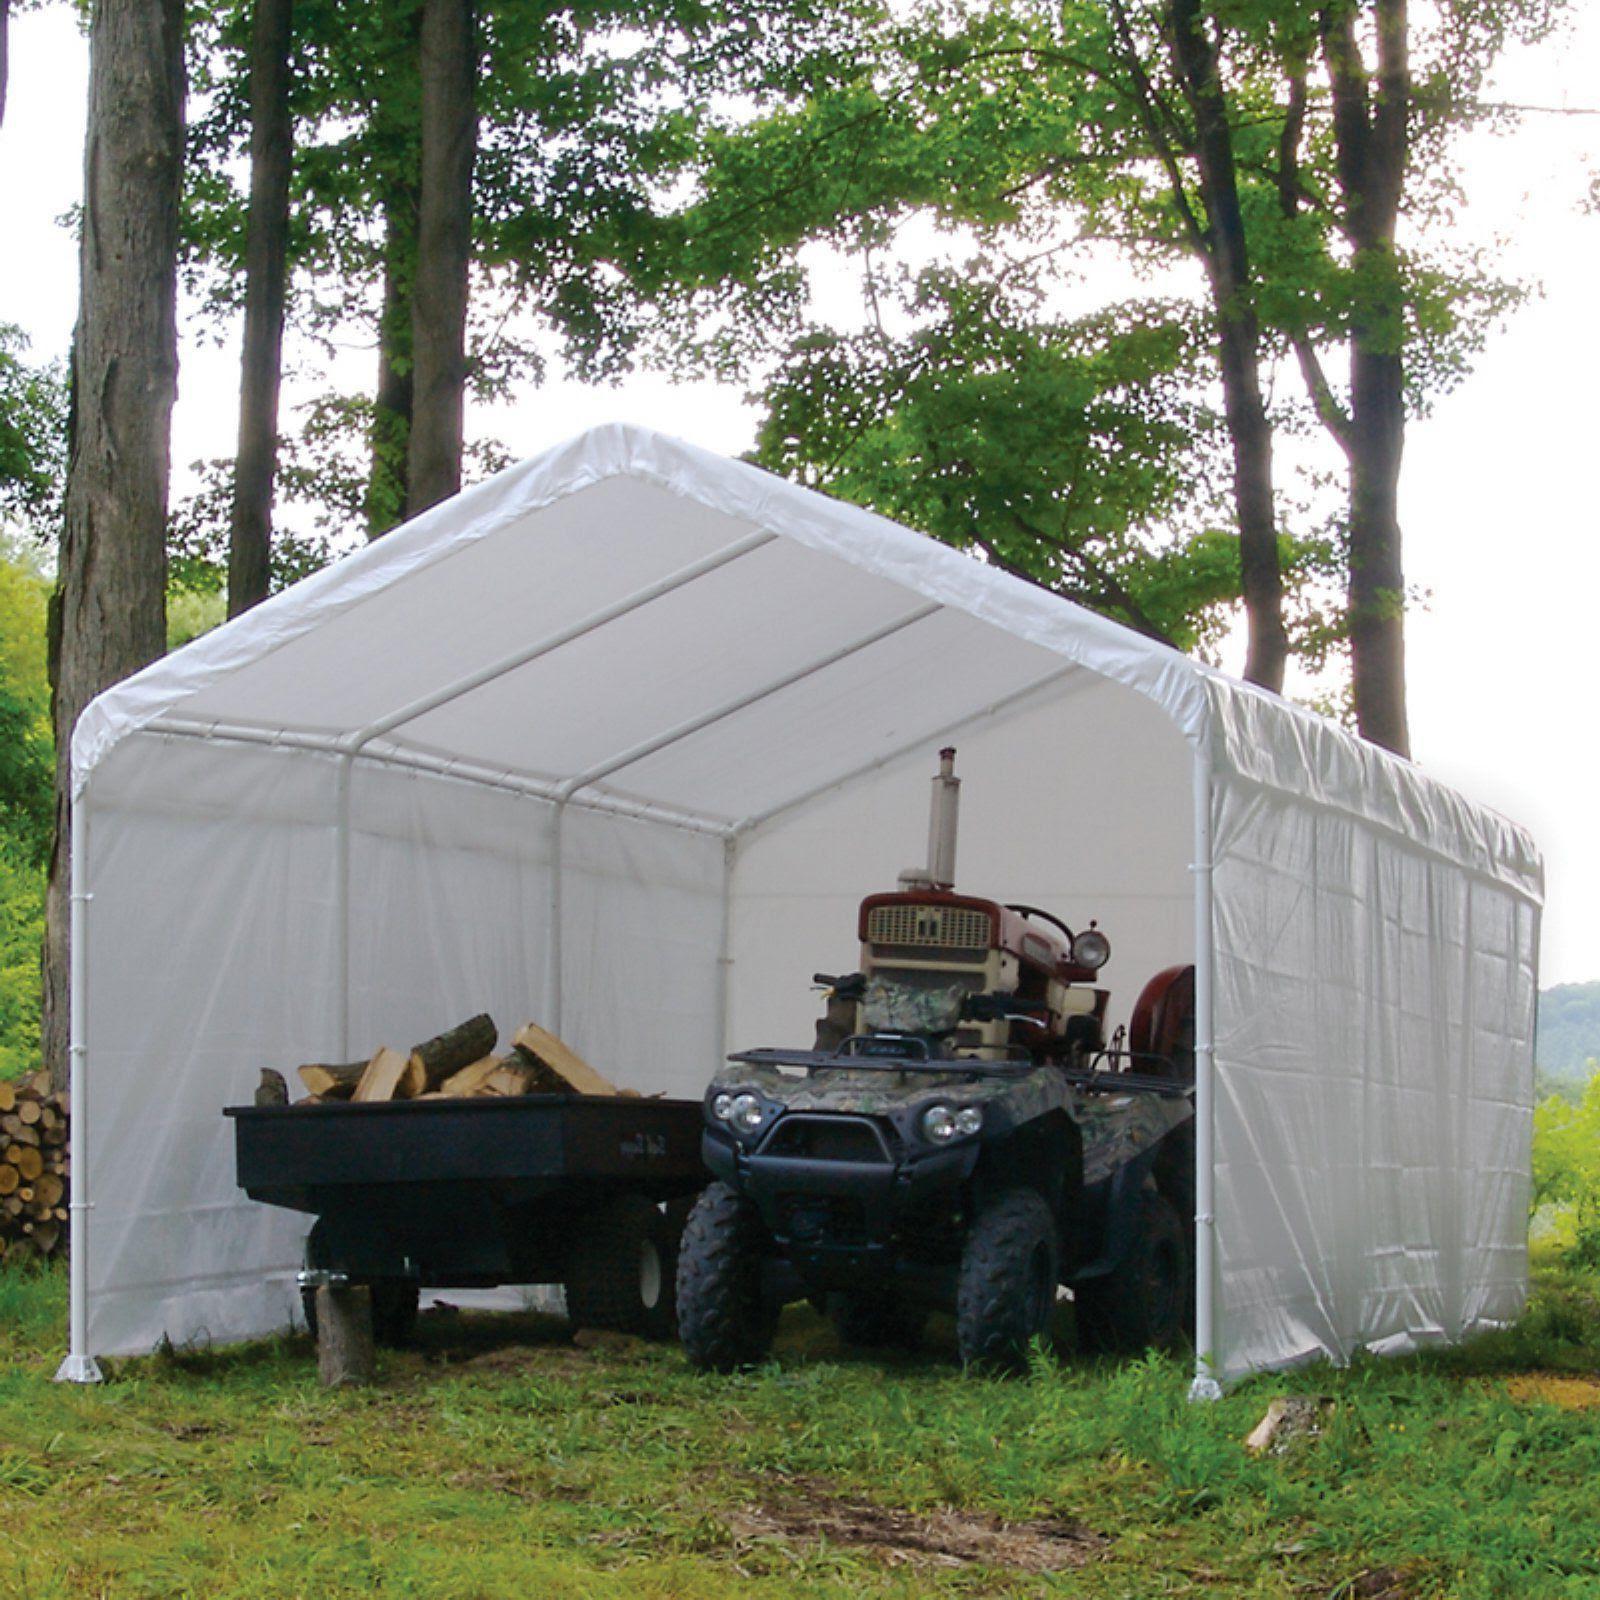 Canopy Enclosure Kit 12x20 Car Port Cover Portable